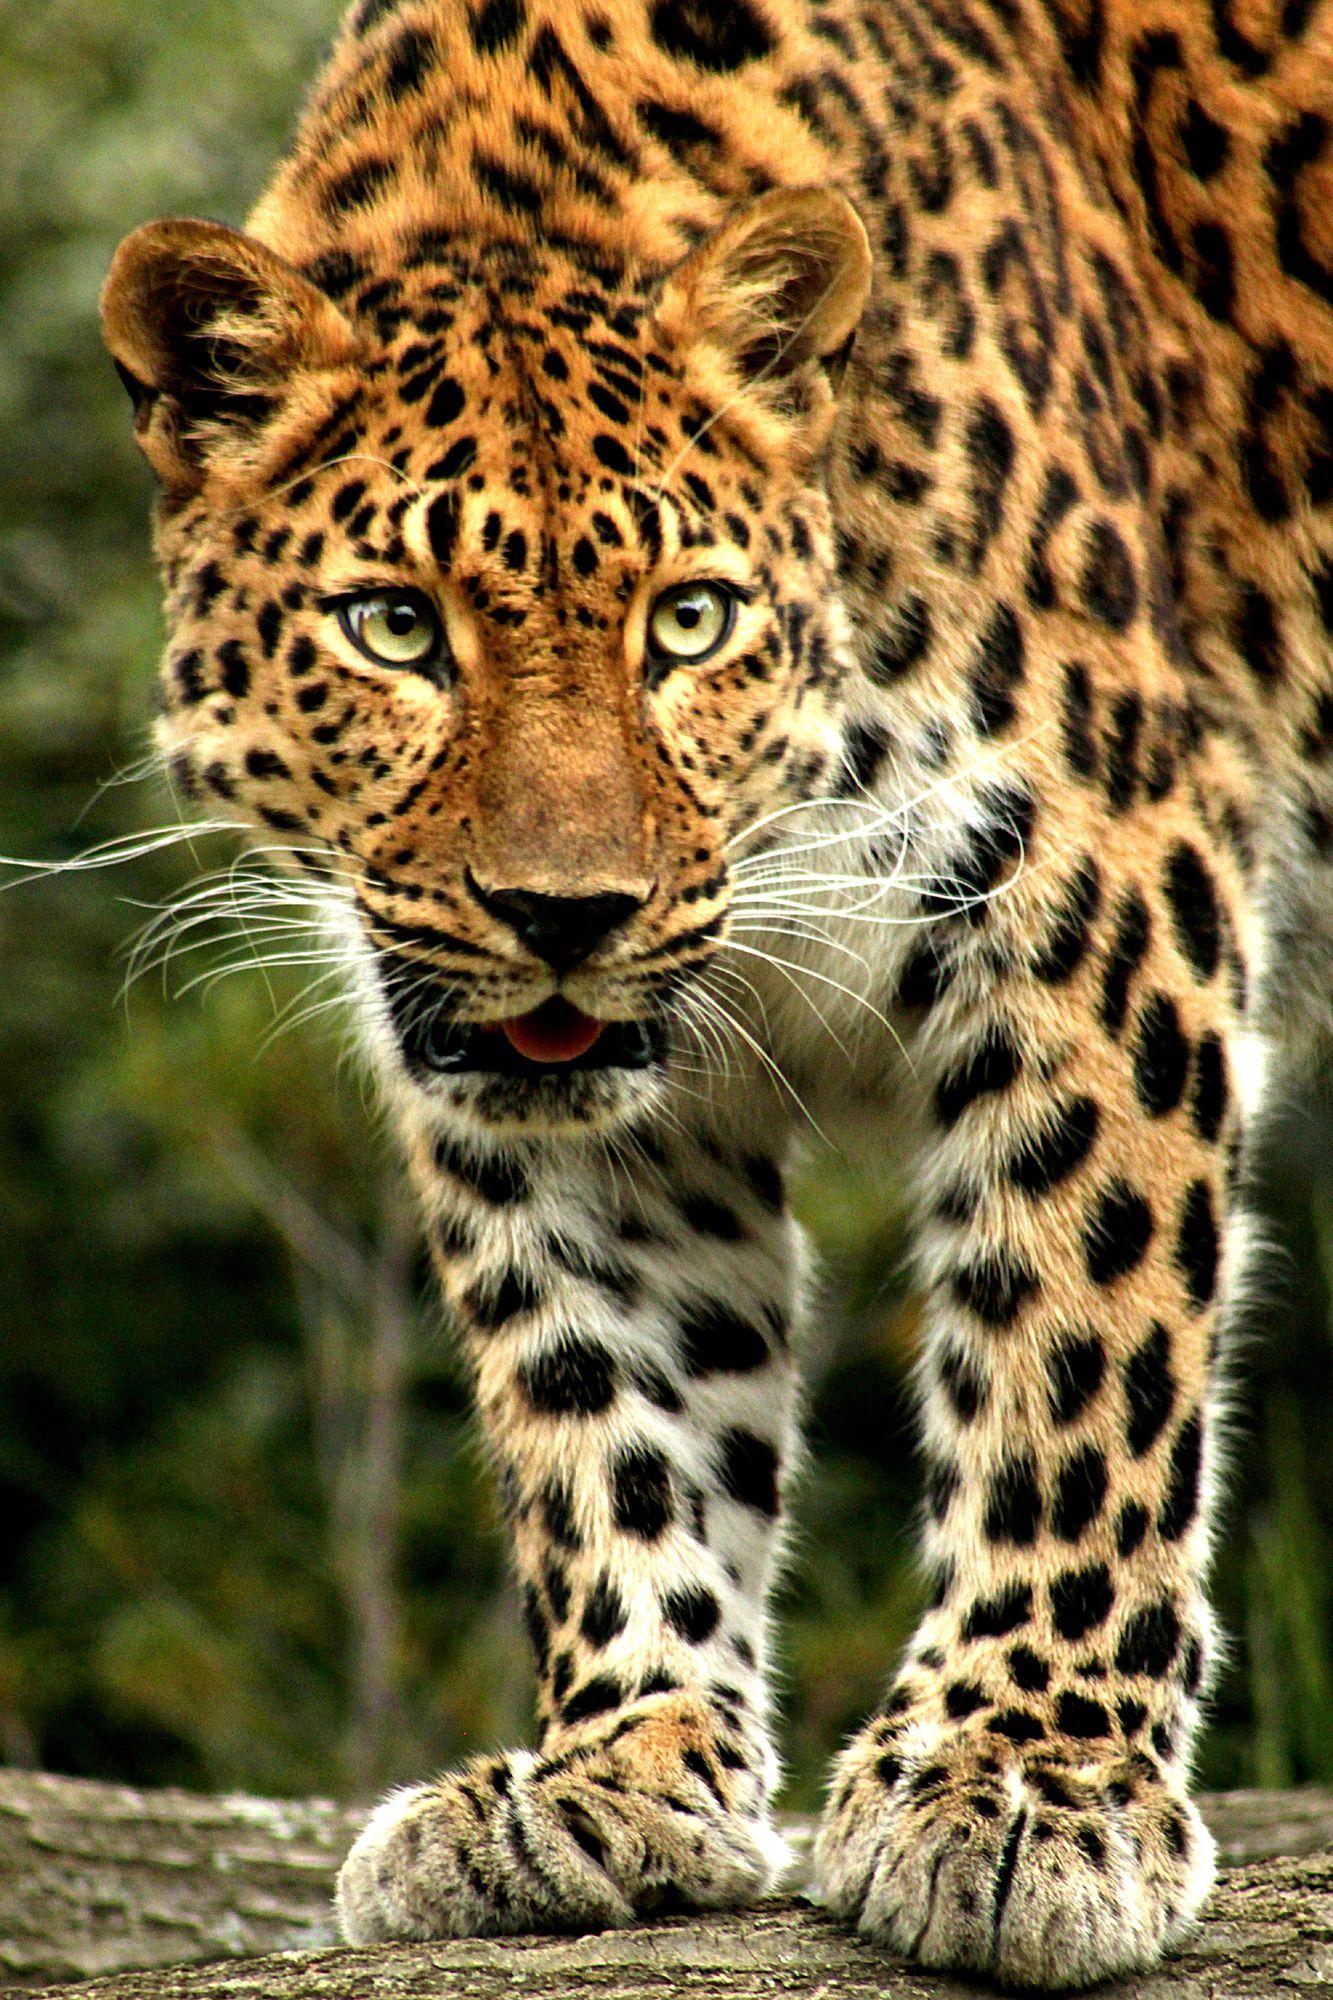 Amur leopard facts image en 2020 | Animales salvajes, Stuffed ...